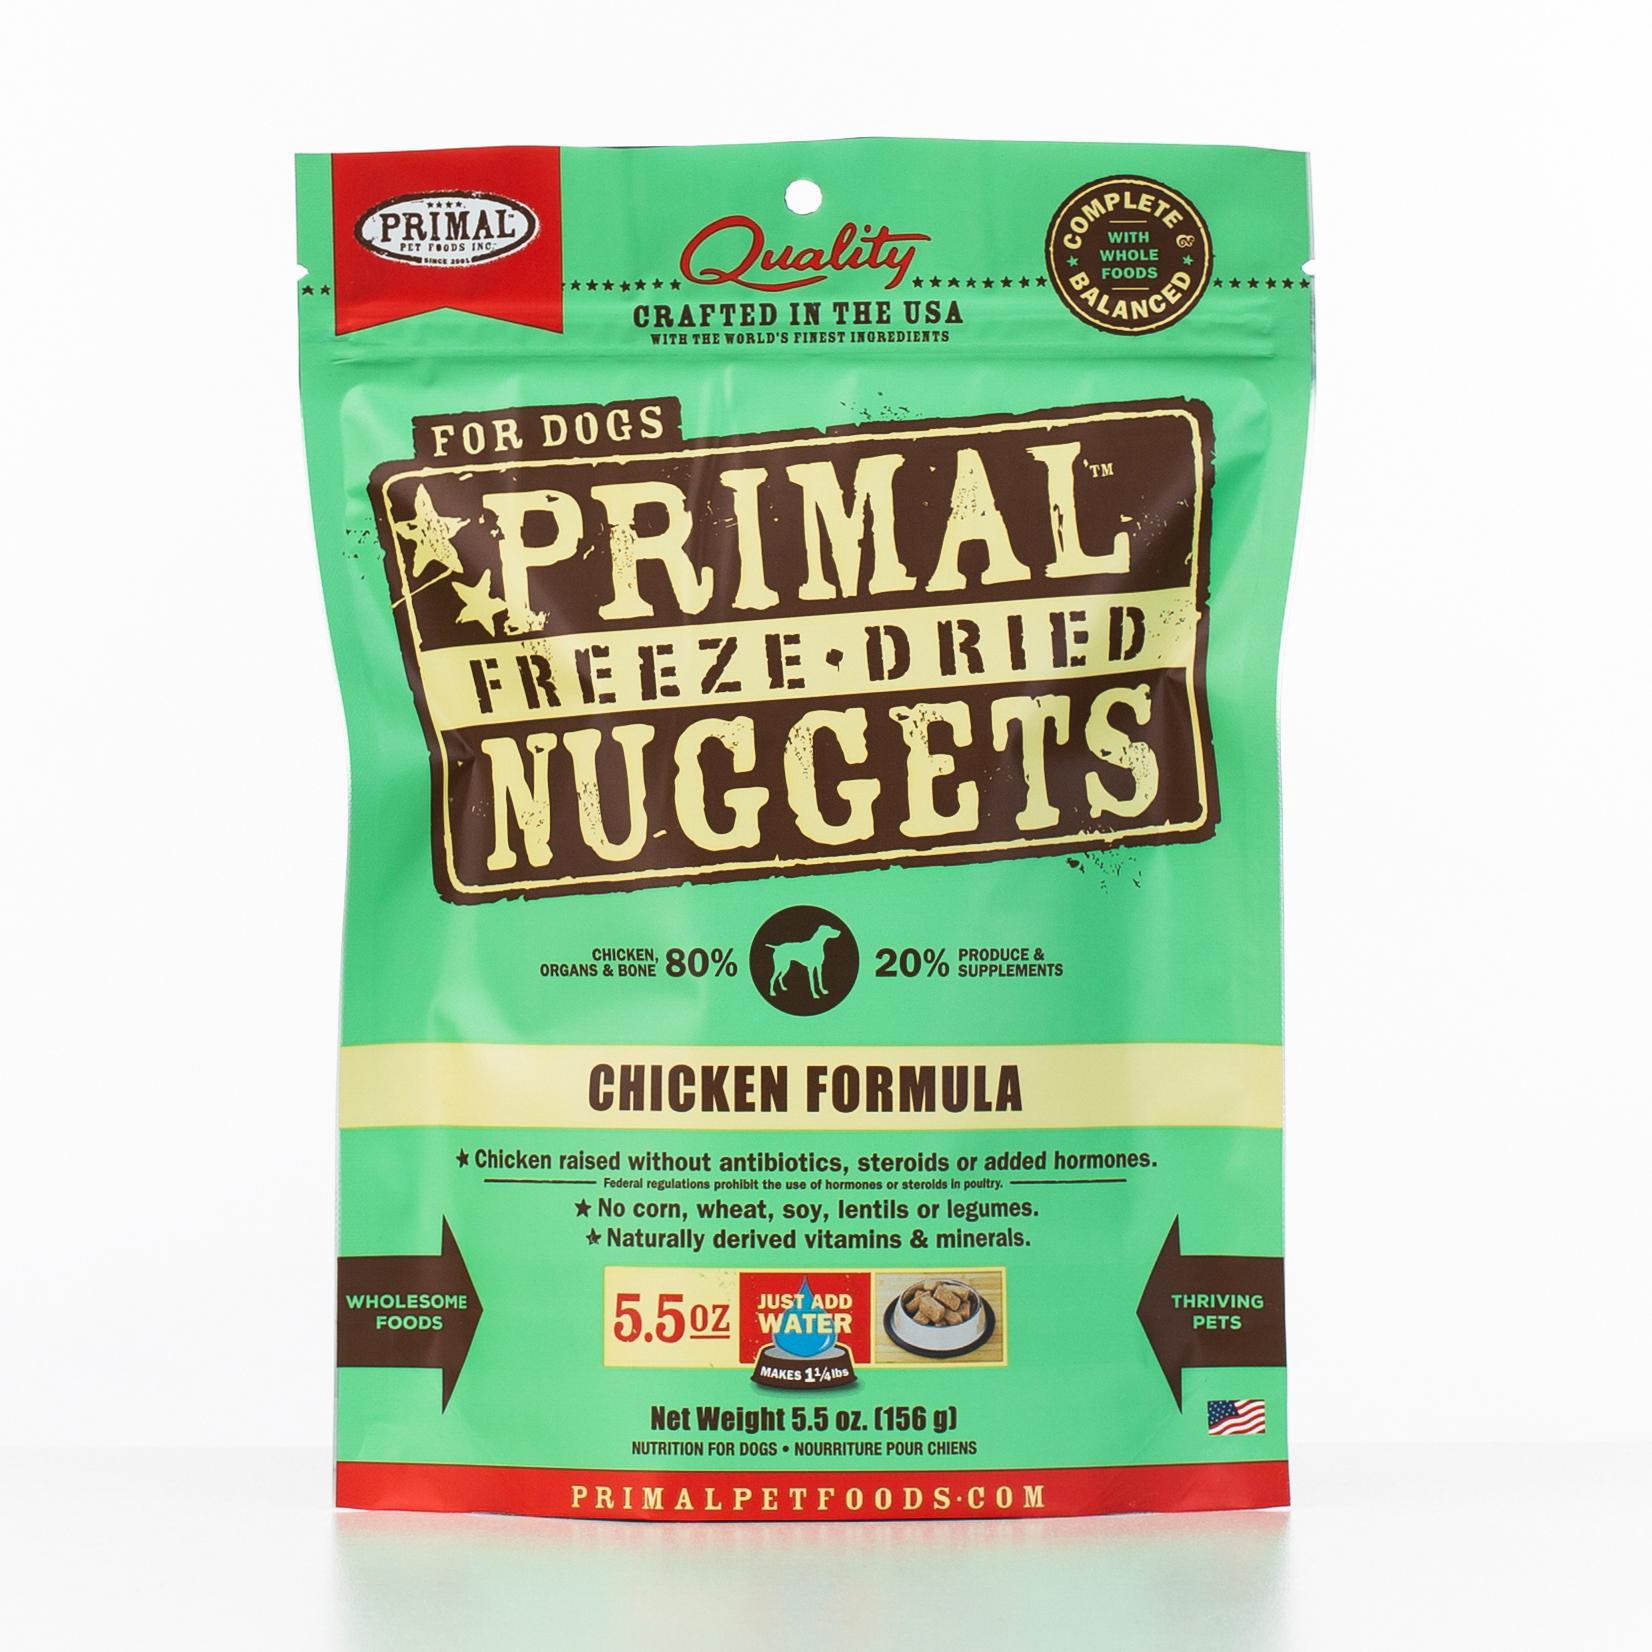 Primal Raw Freeze-Dried Nuggets Chicken Formula Dog Food, 5.5-oz bag